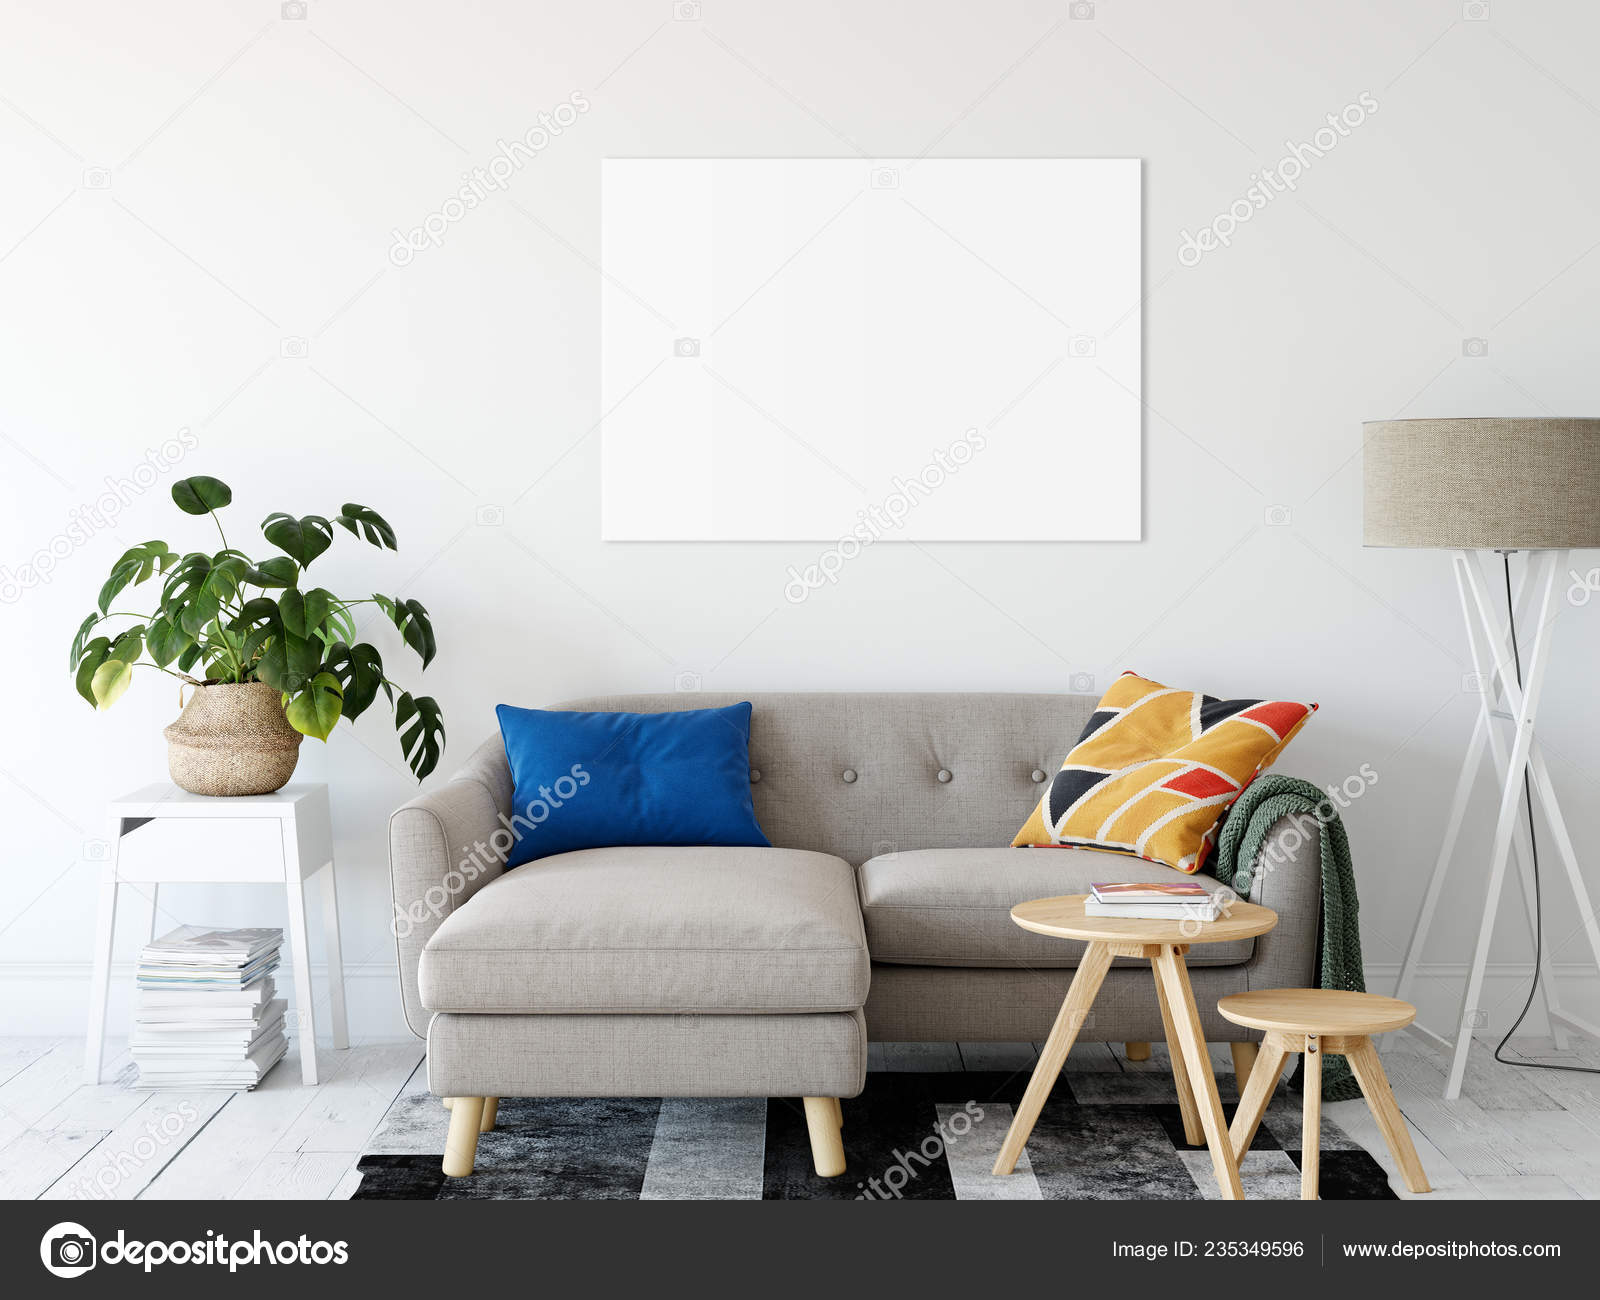 Frame Mockup Living Room Interior Wall Mockup Wall Art Rendering Stock Photo C Yuri U 235349596